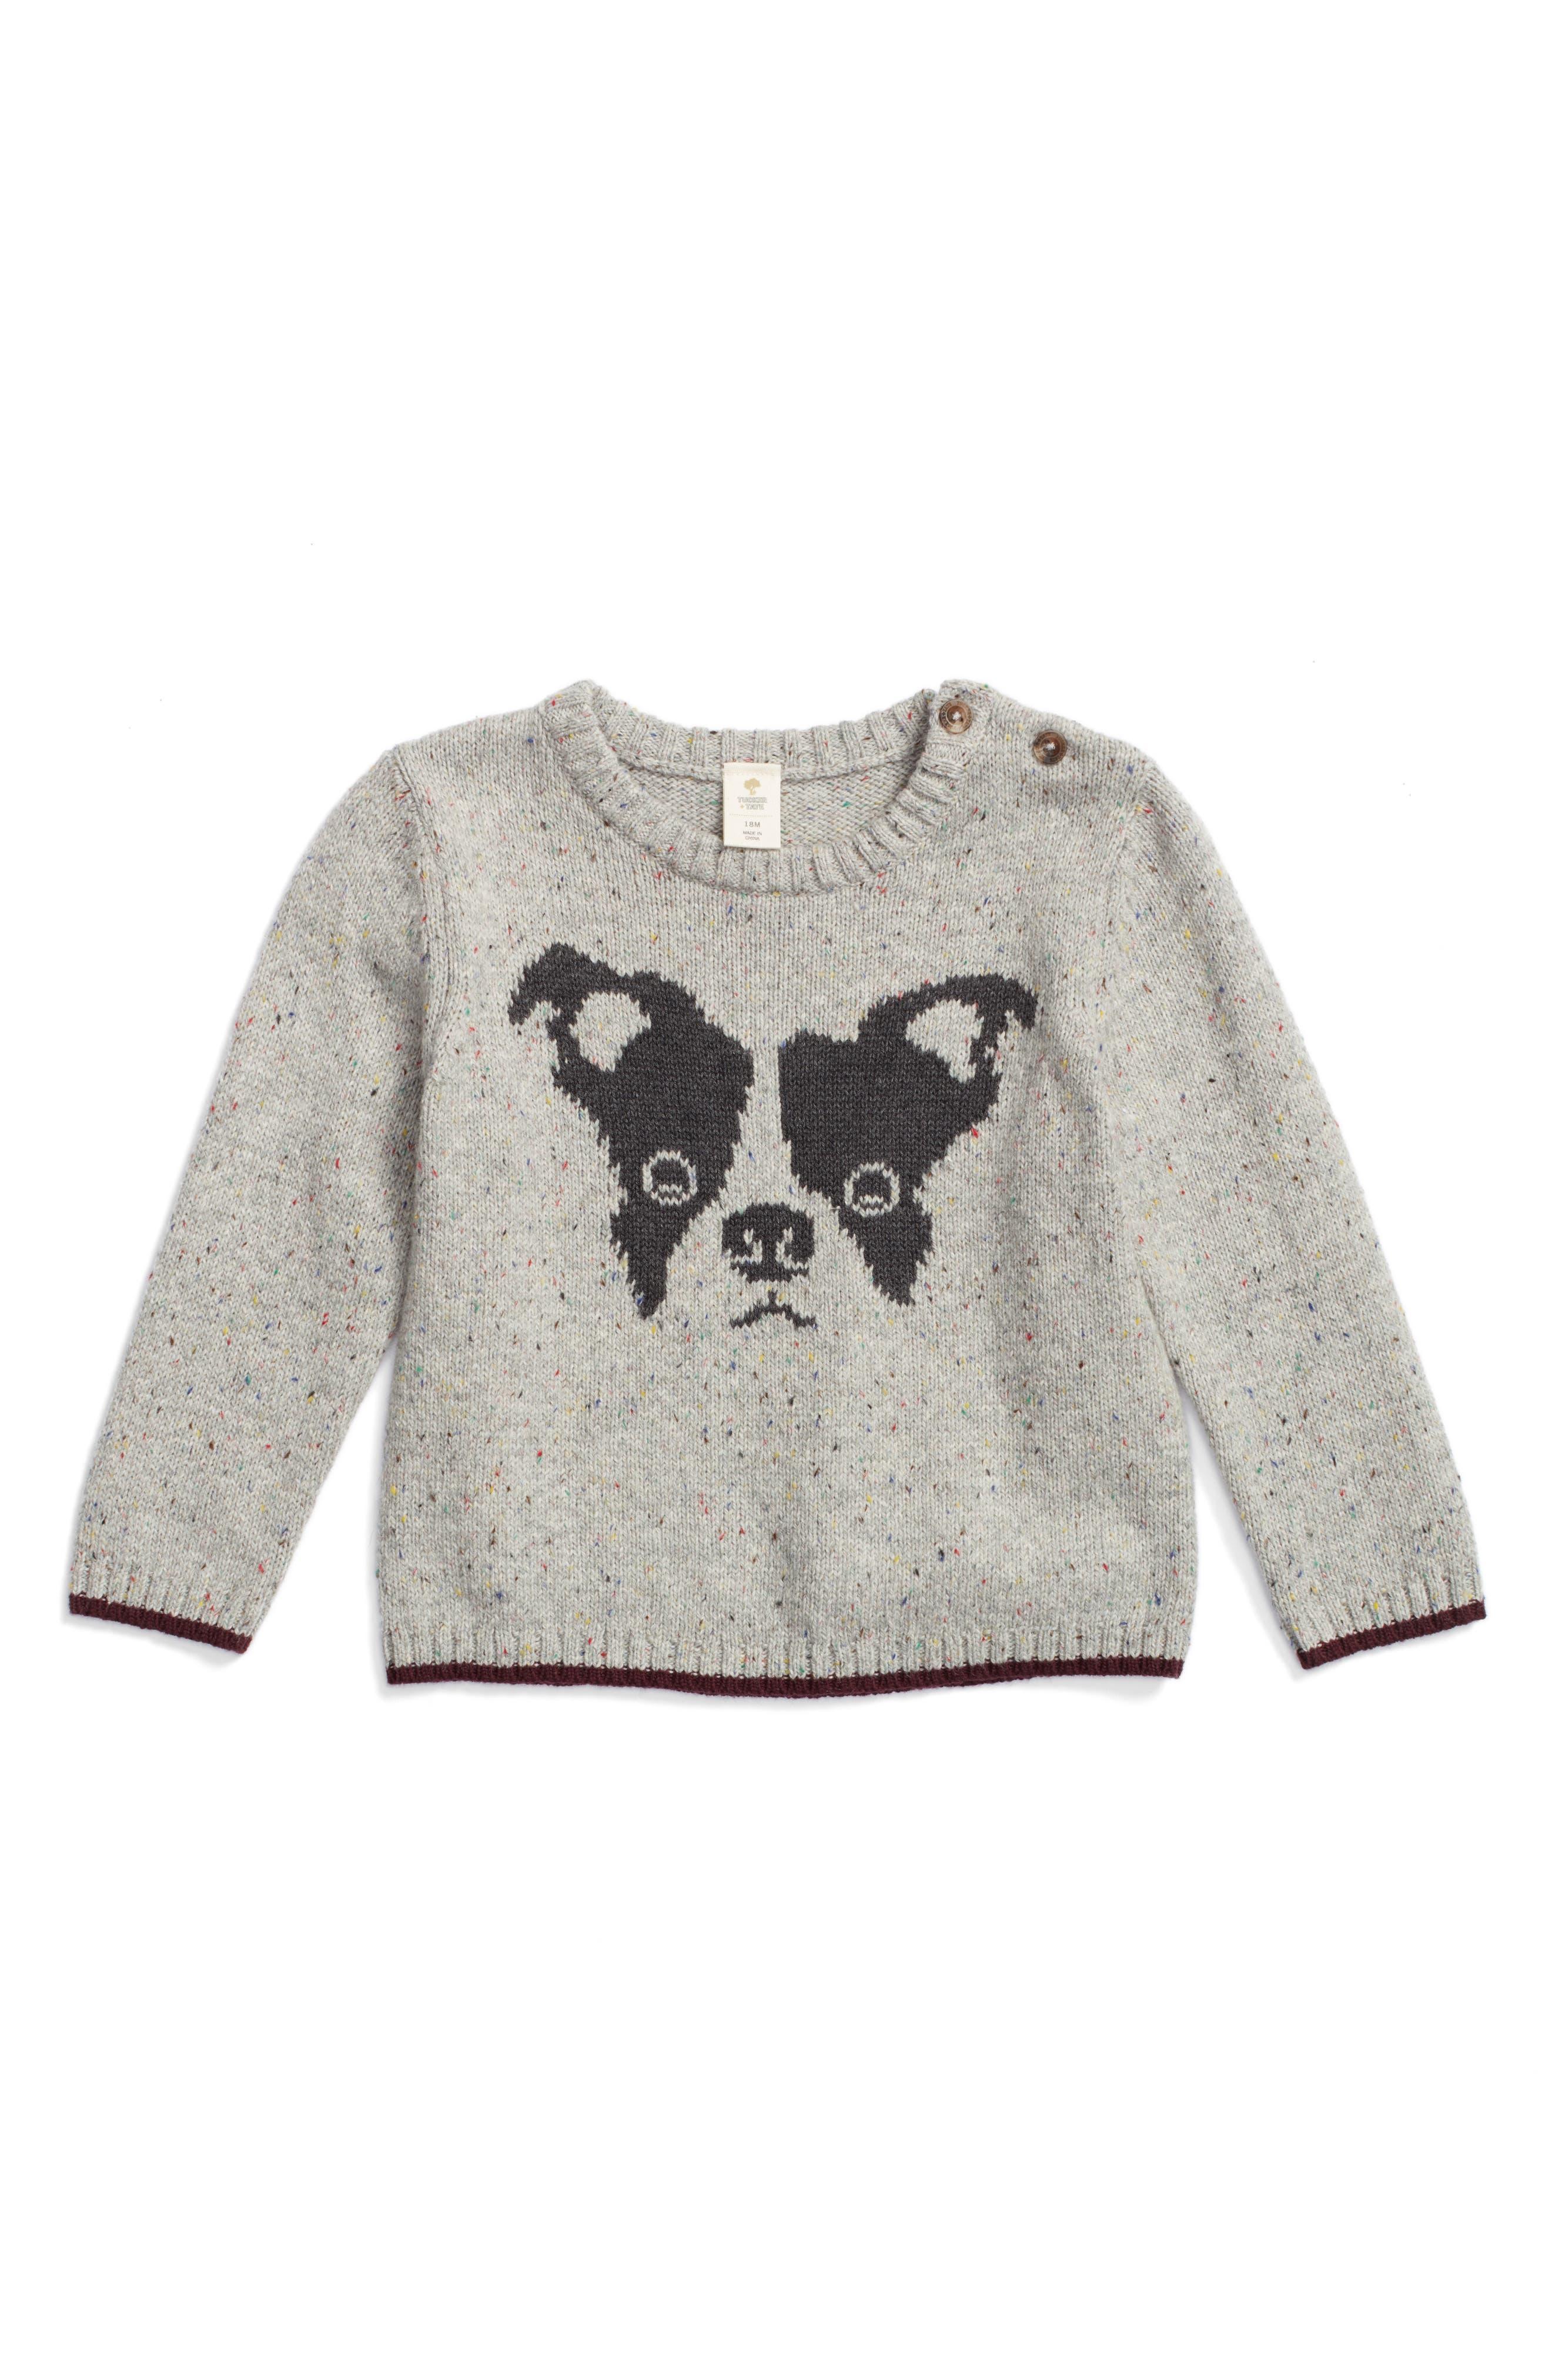 Intarsia Knit Dog Sweater,                         Main,                         color, Grey Ash Heather Dog